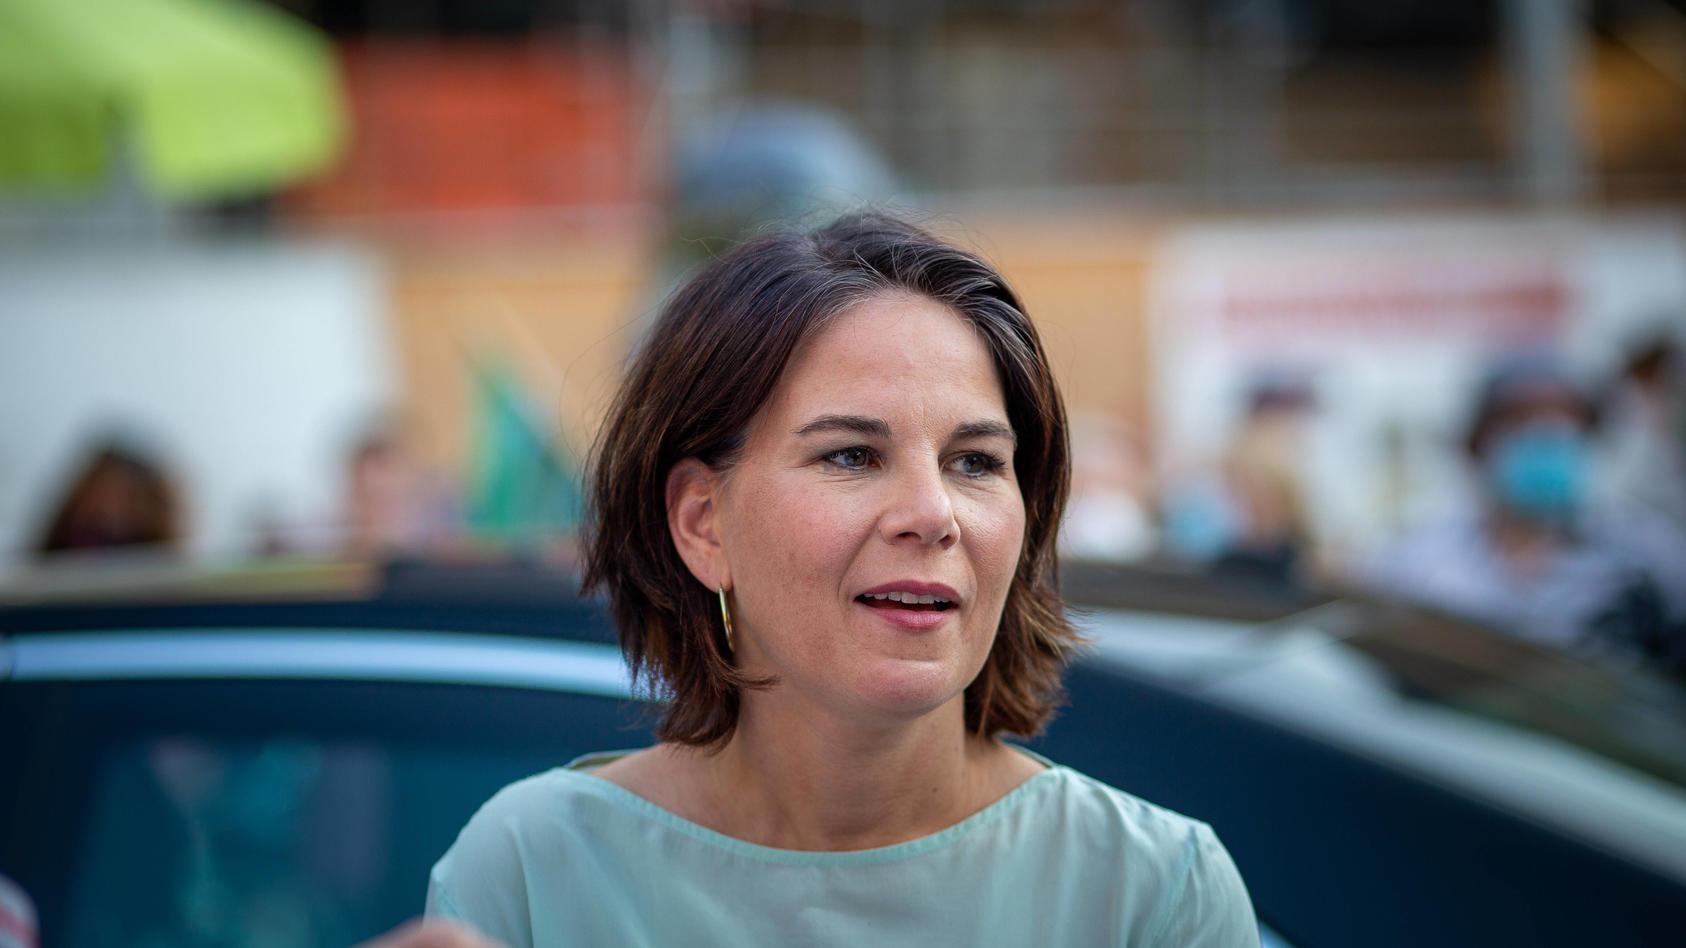 Annalena Baerbock im Wahlkampf